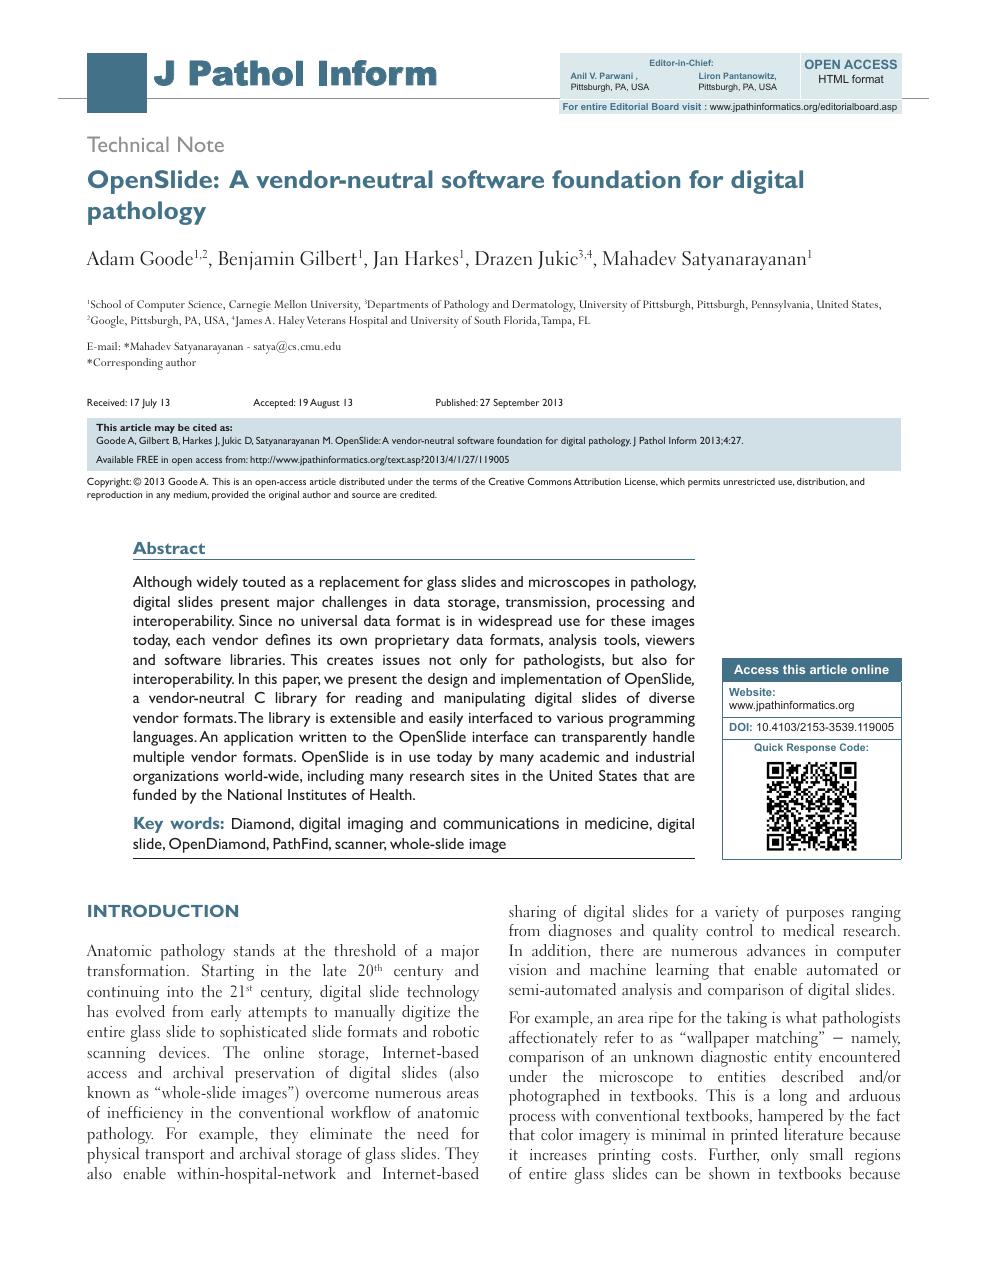 OpenSlide: A vendor-neutral software foundation for digital